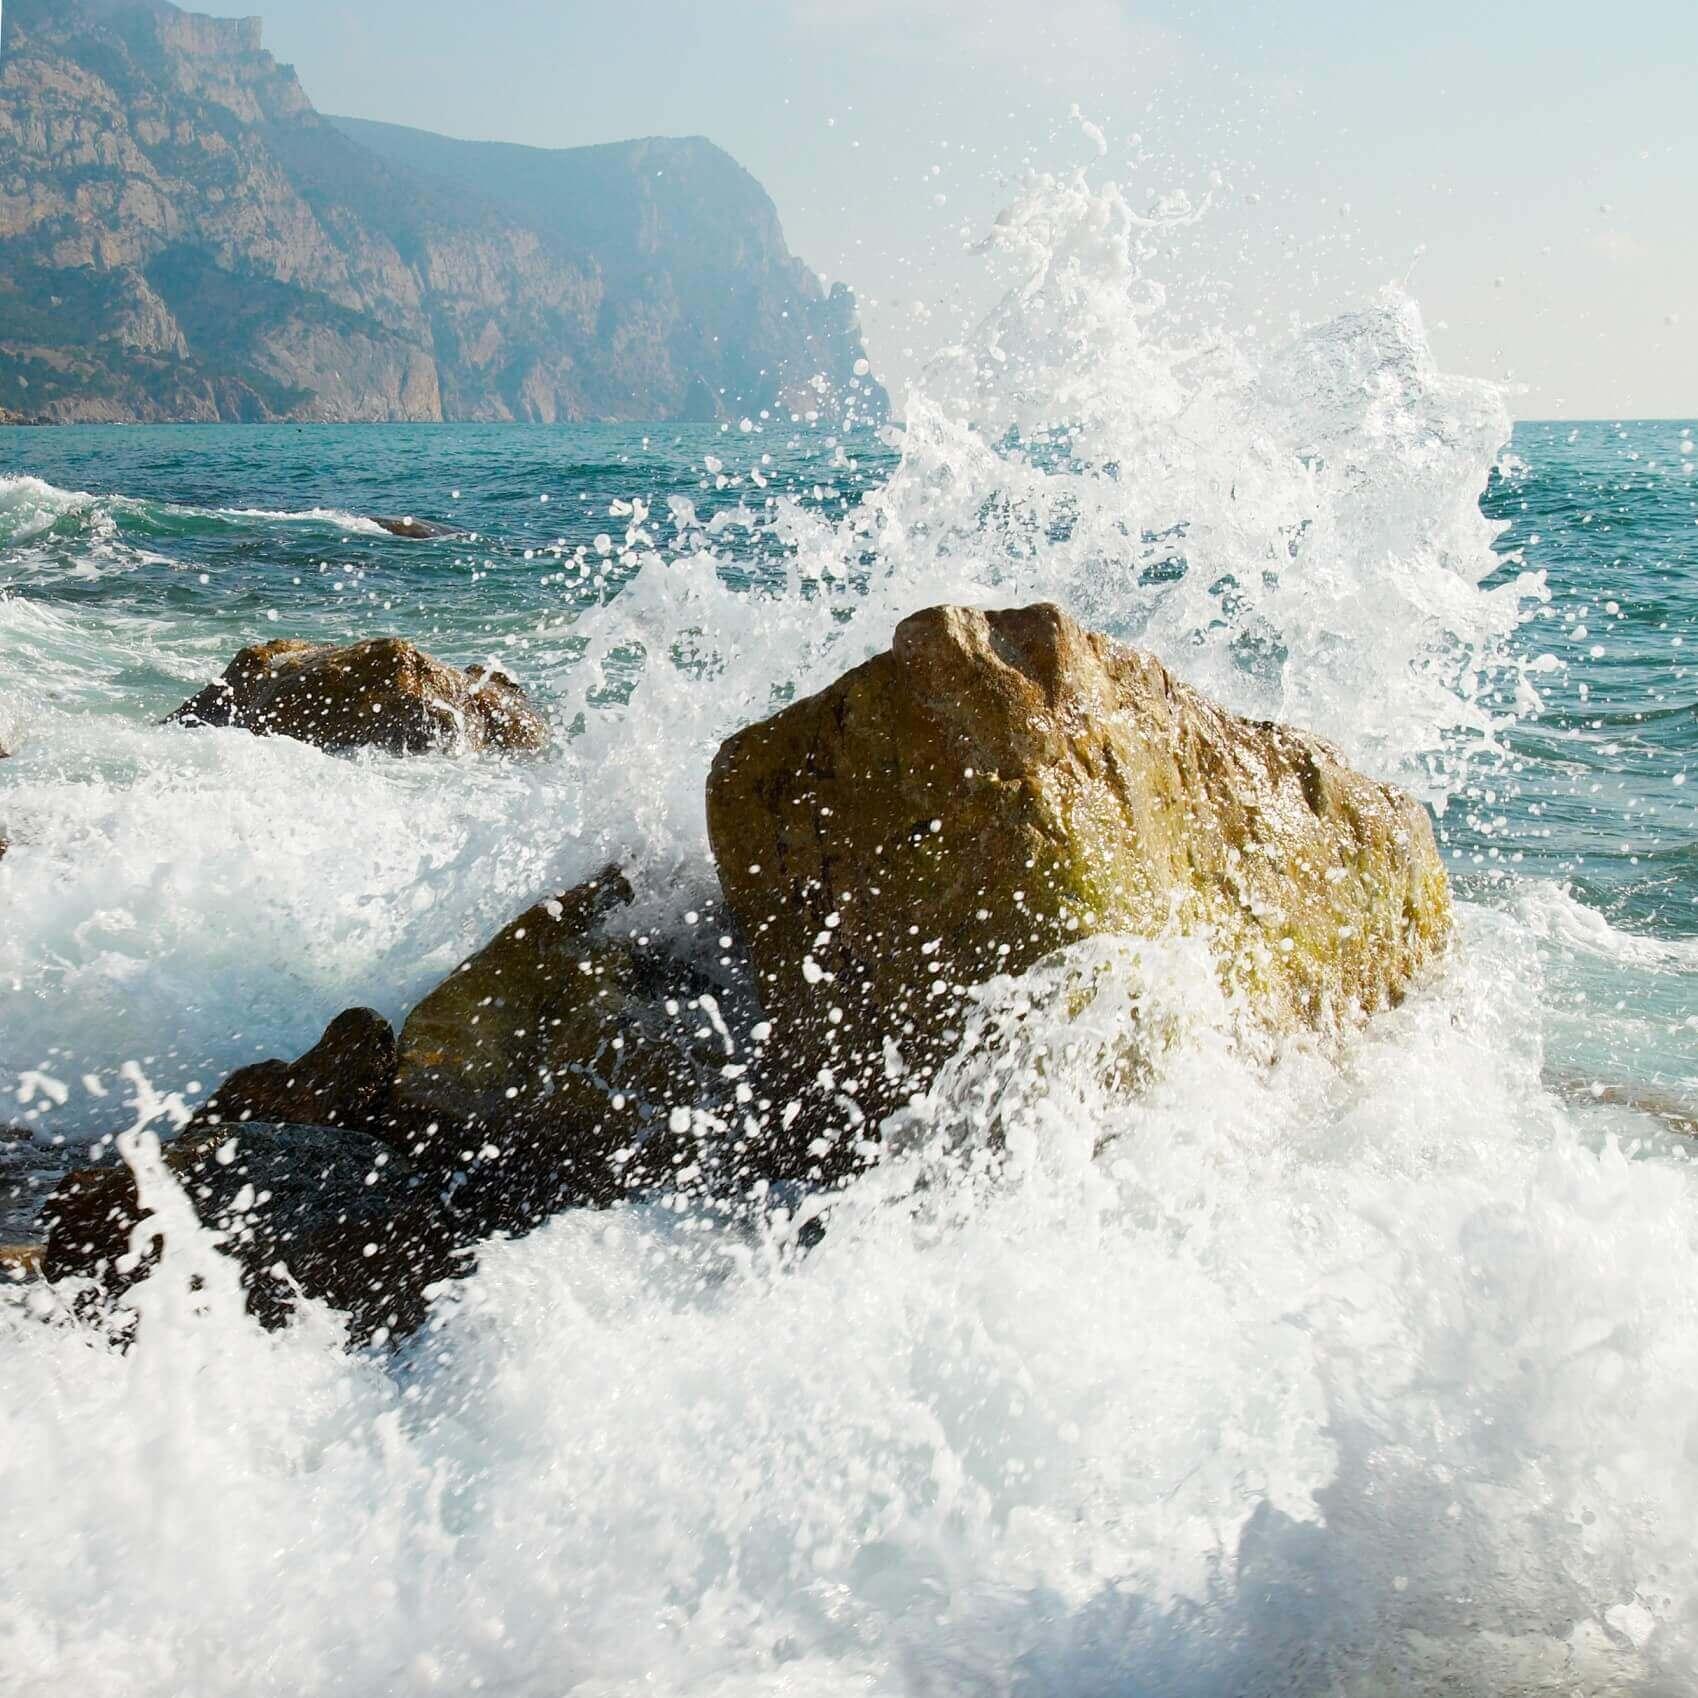 Ocean wave crashing against a rock